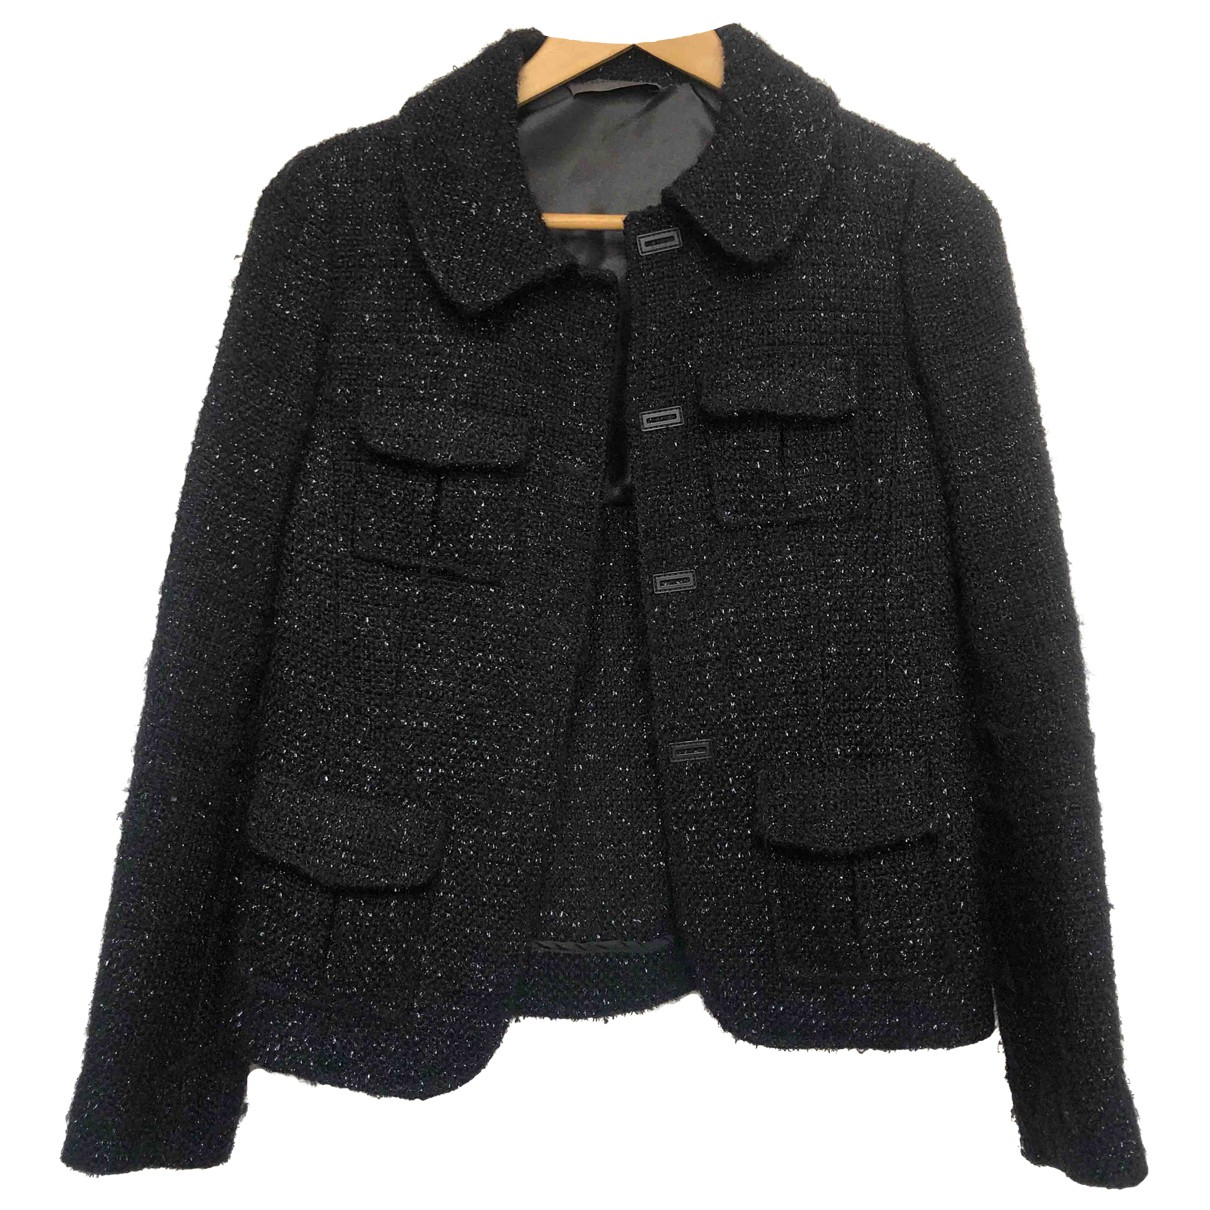 Alberta Ferretti N Black Wool jacket for Women 0 0-5